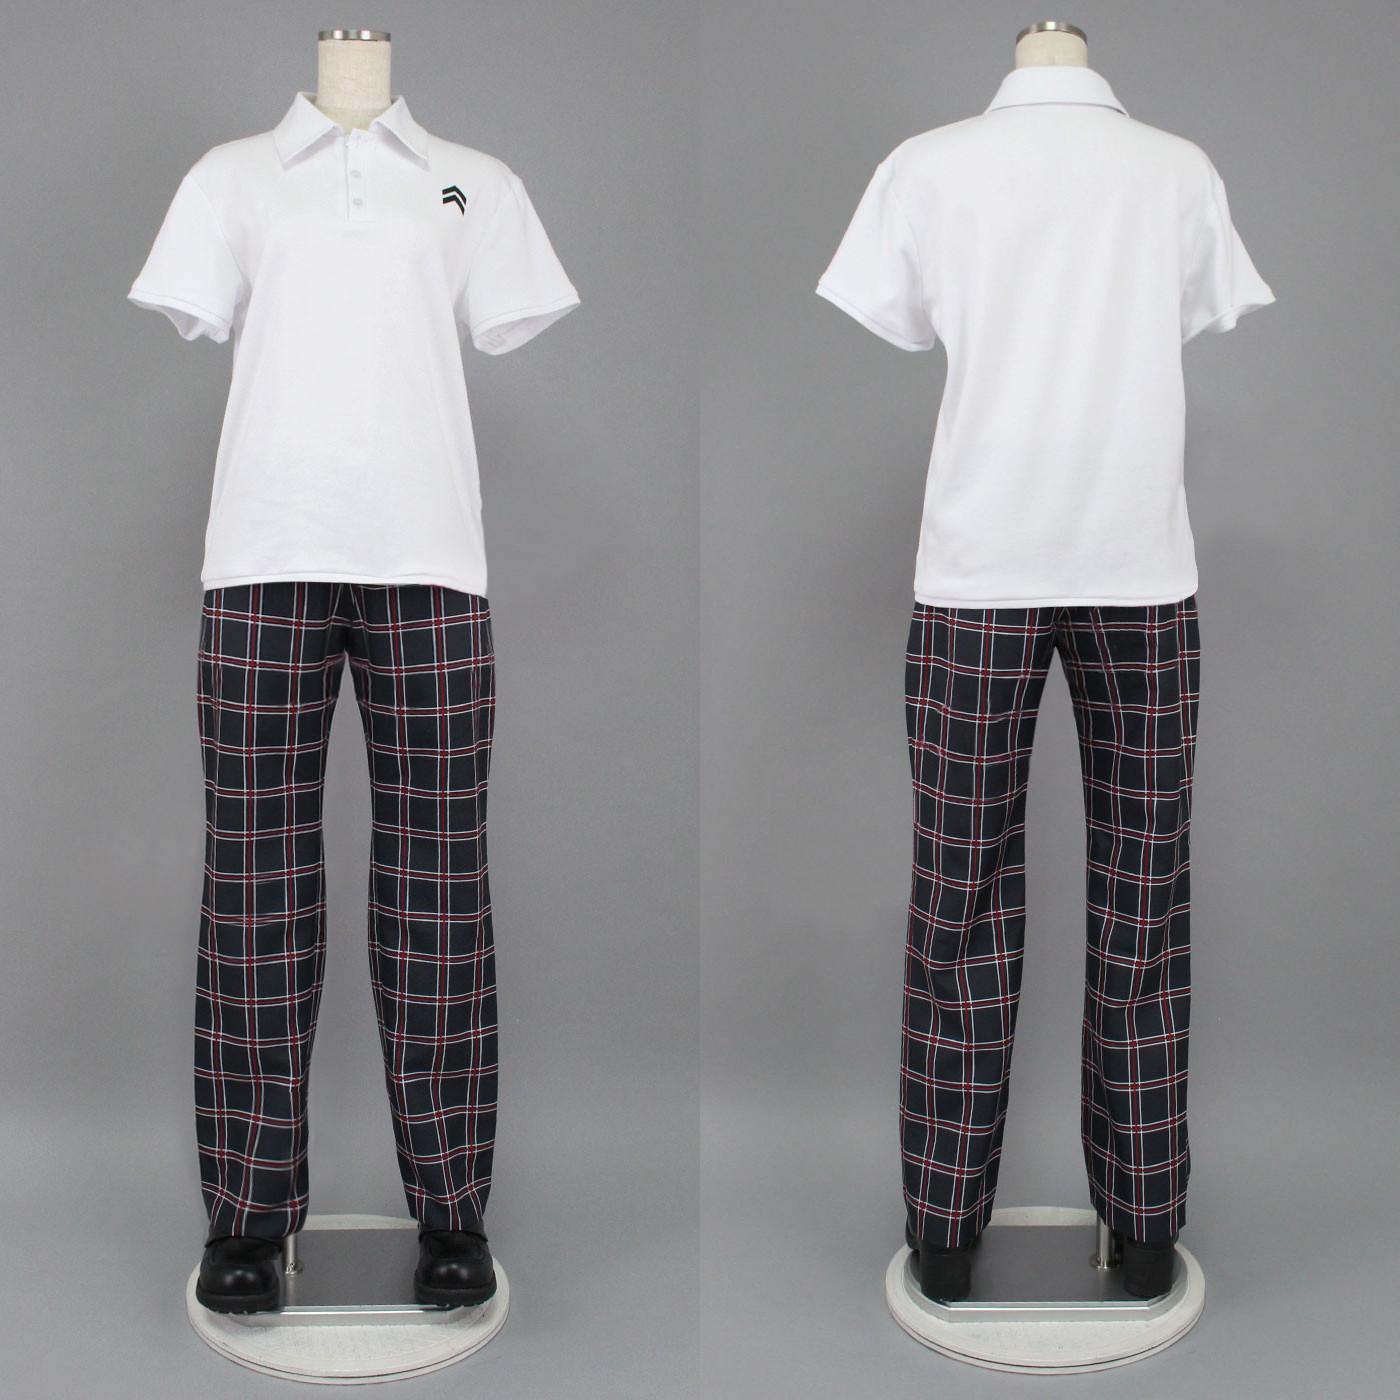 Persona 5 Amamiya Ren Joker Summer Outfit Cosplay Costumes